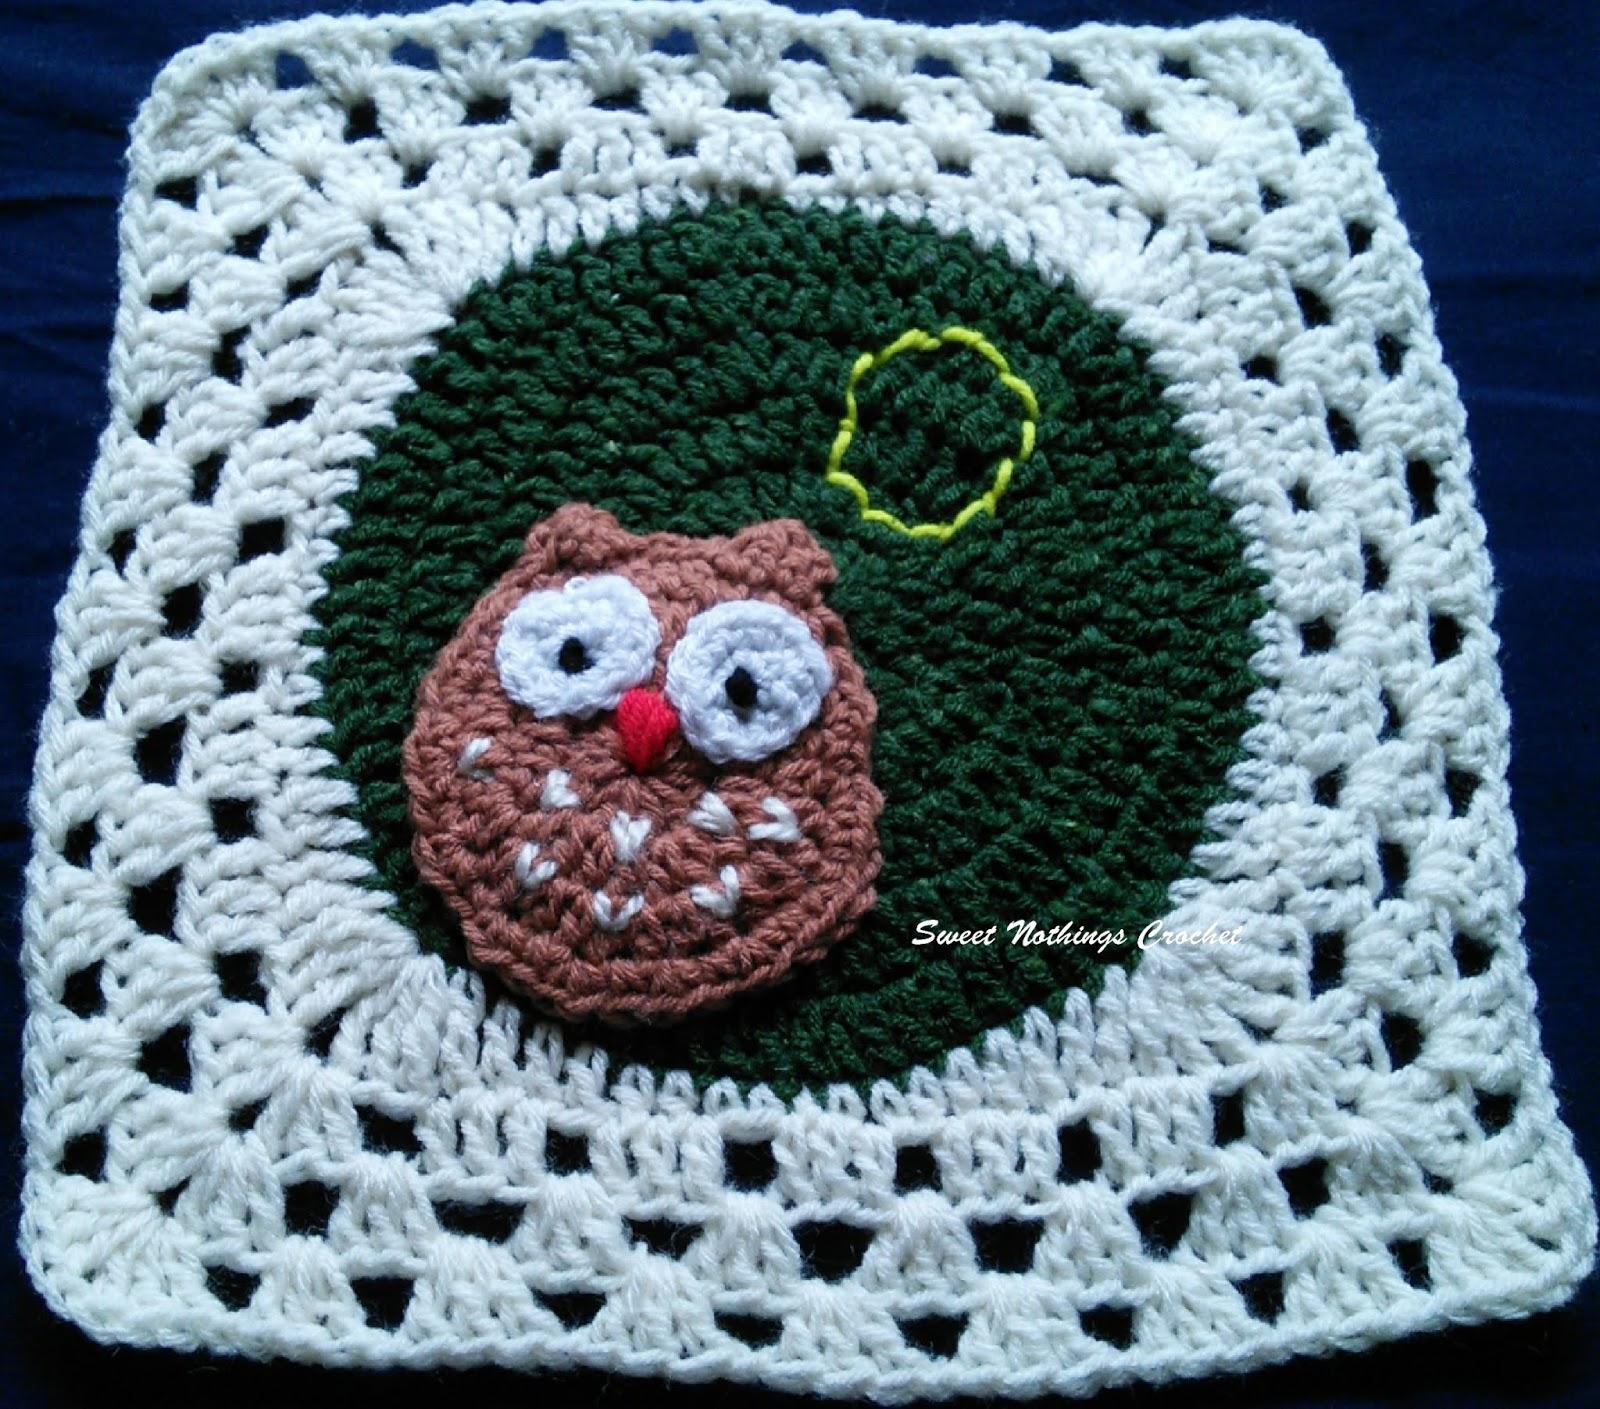 Sweet Nothings Crochet O For Owl Granny Square Alphabet Series